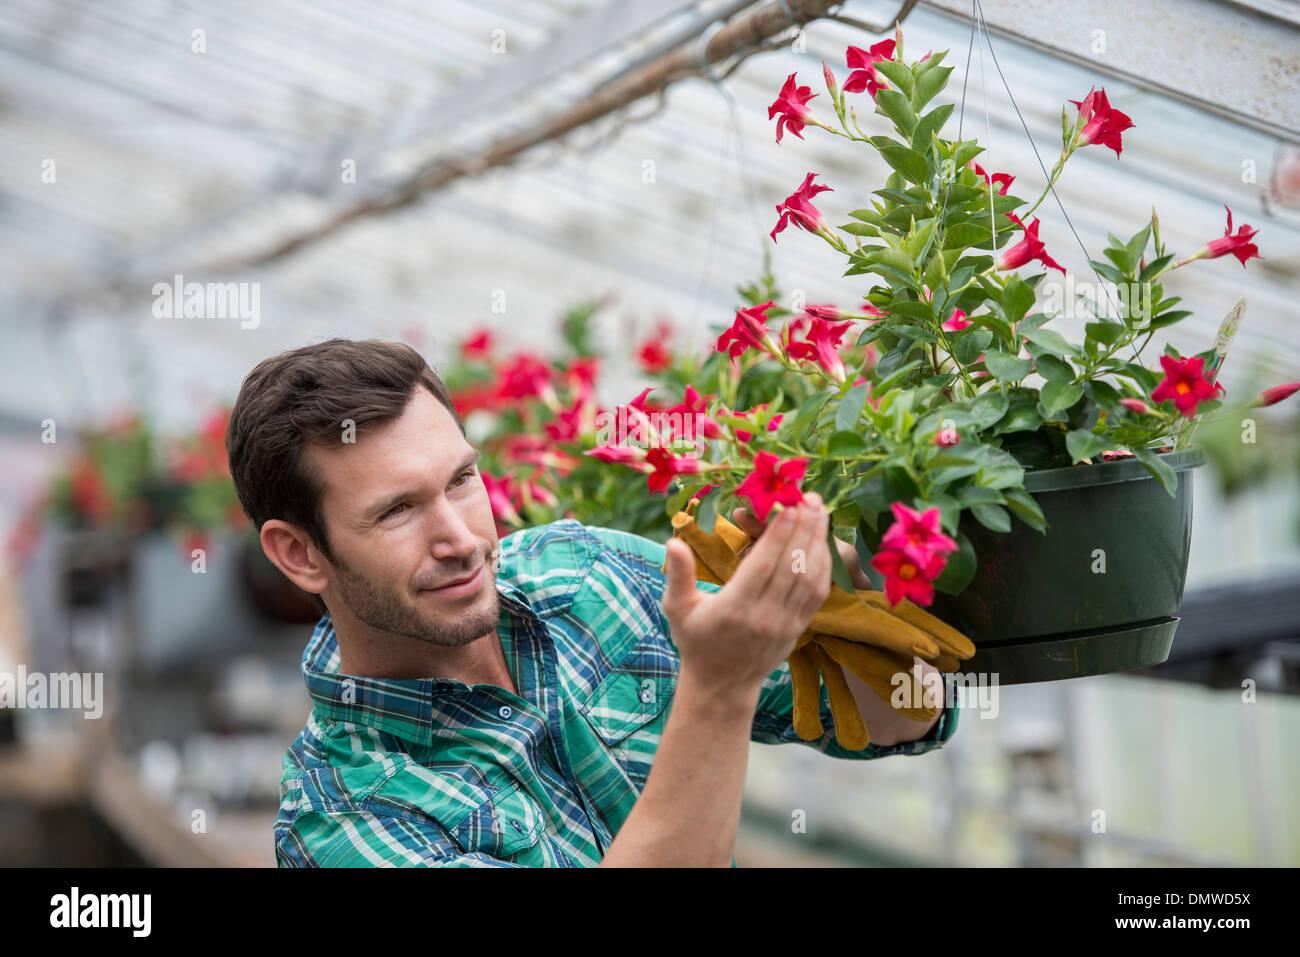 An organic flower plant nursery. A man checking  hanging baskets. - Stock Image